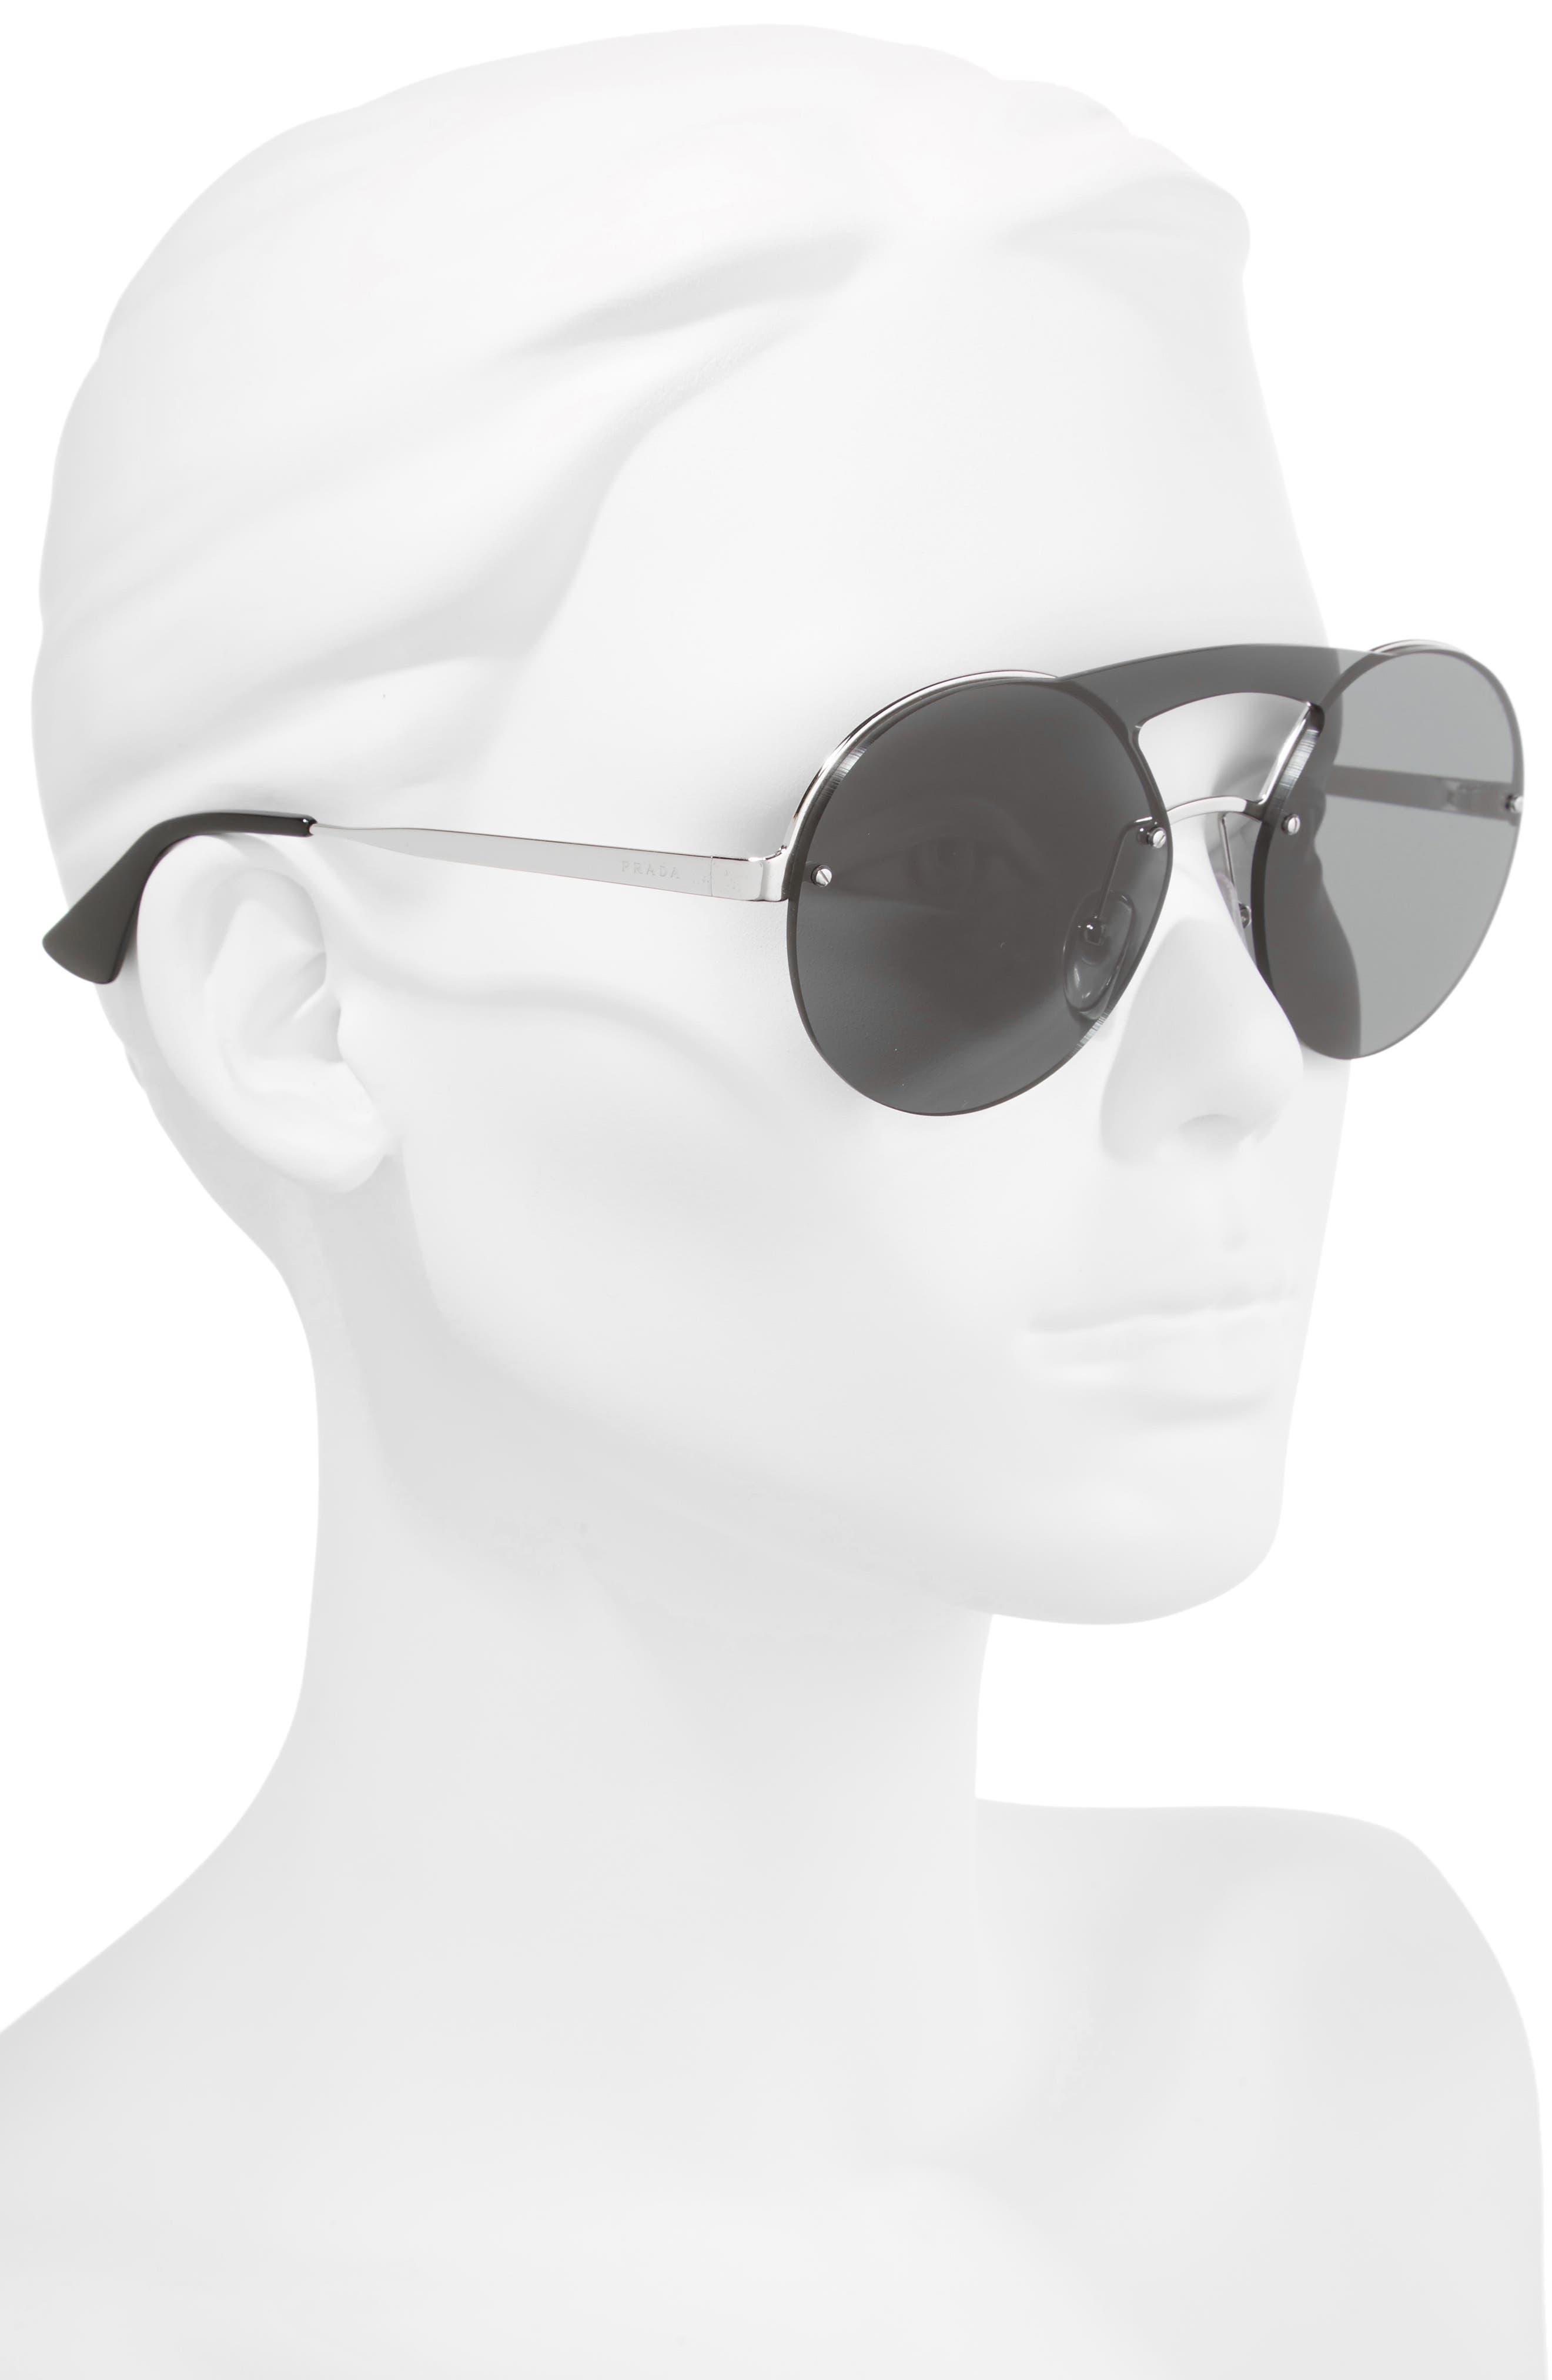 60mm Round Rimless Sunglasses,                             Alternate thumbnail 2, color,                             020